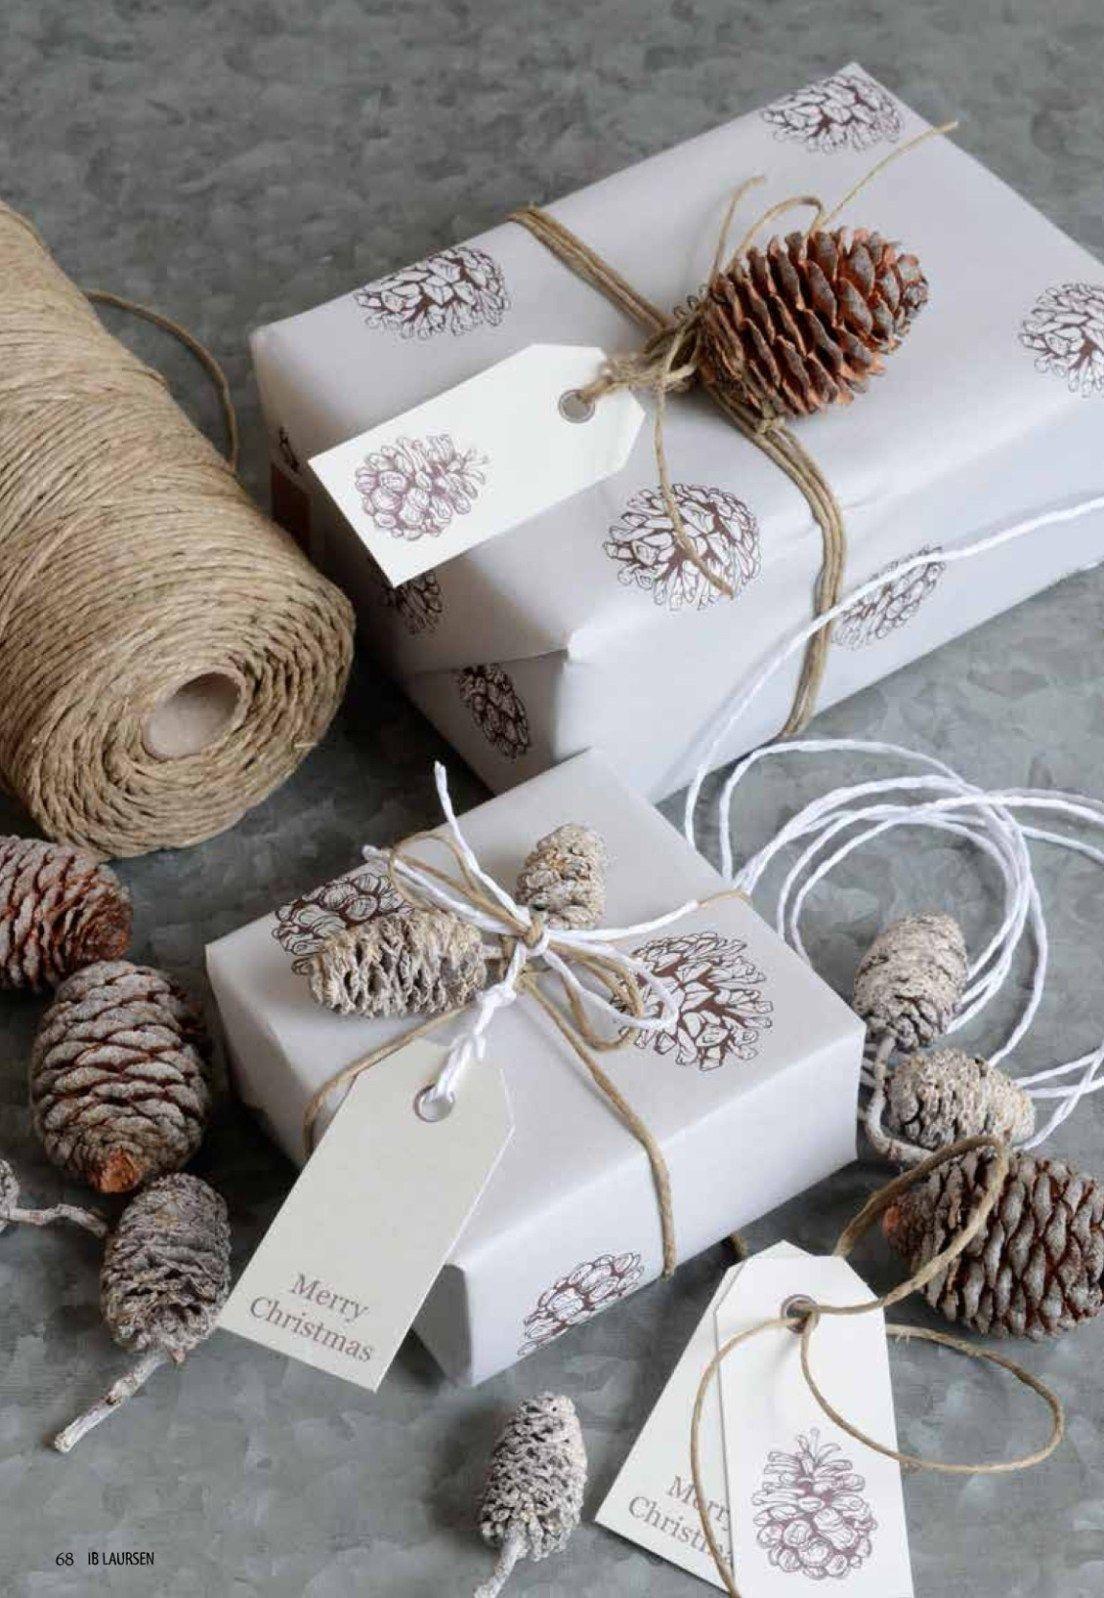 DIY de Noël en 2020 (avec images) Diy noël, Emballage